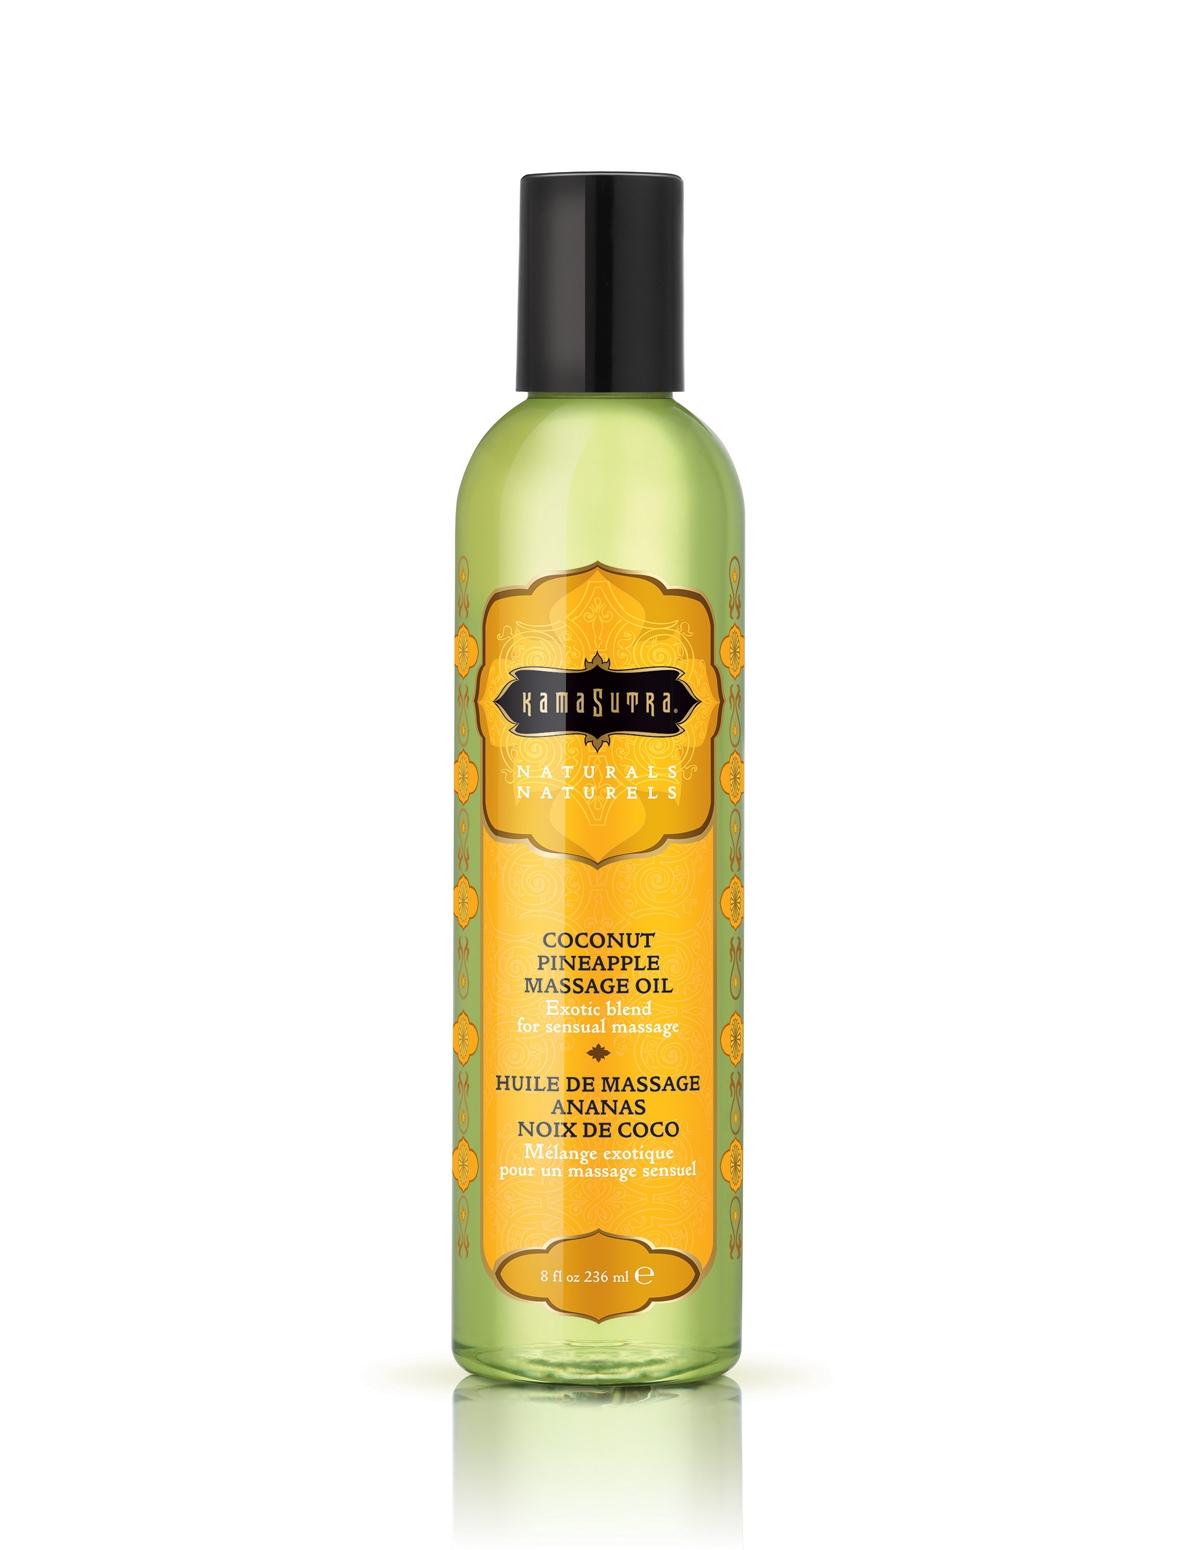 Naturals Coconut Pineapple Massage Oil